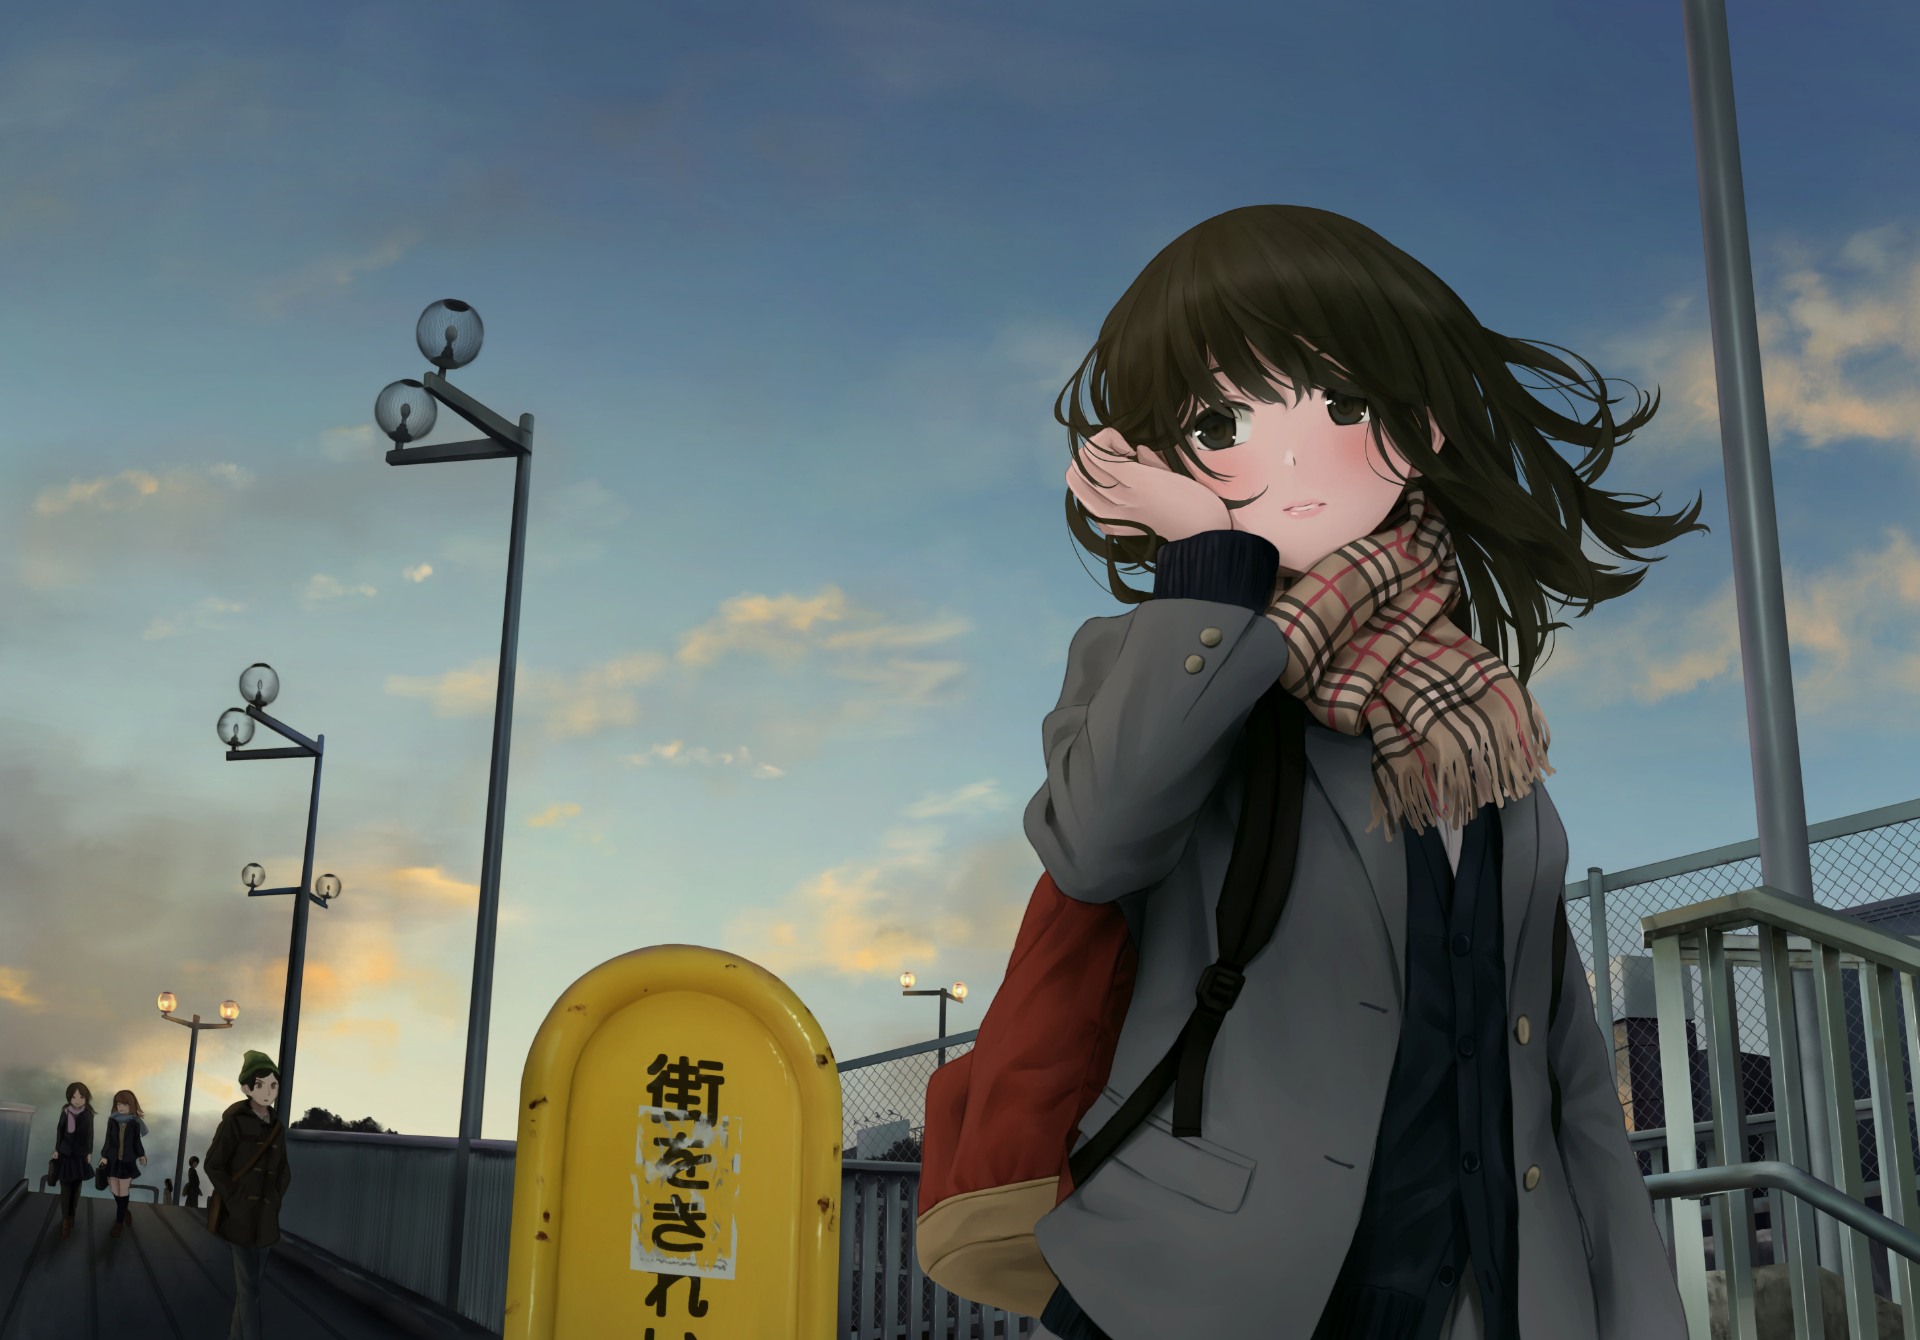 Anime - Original  Wallpaper